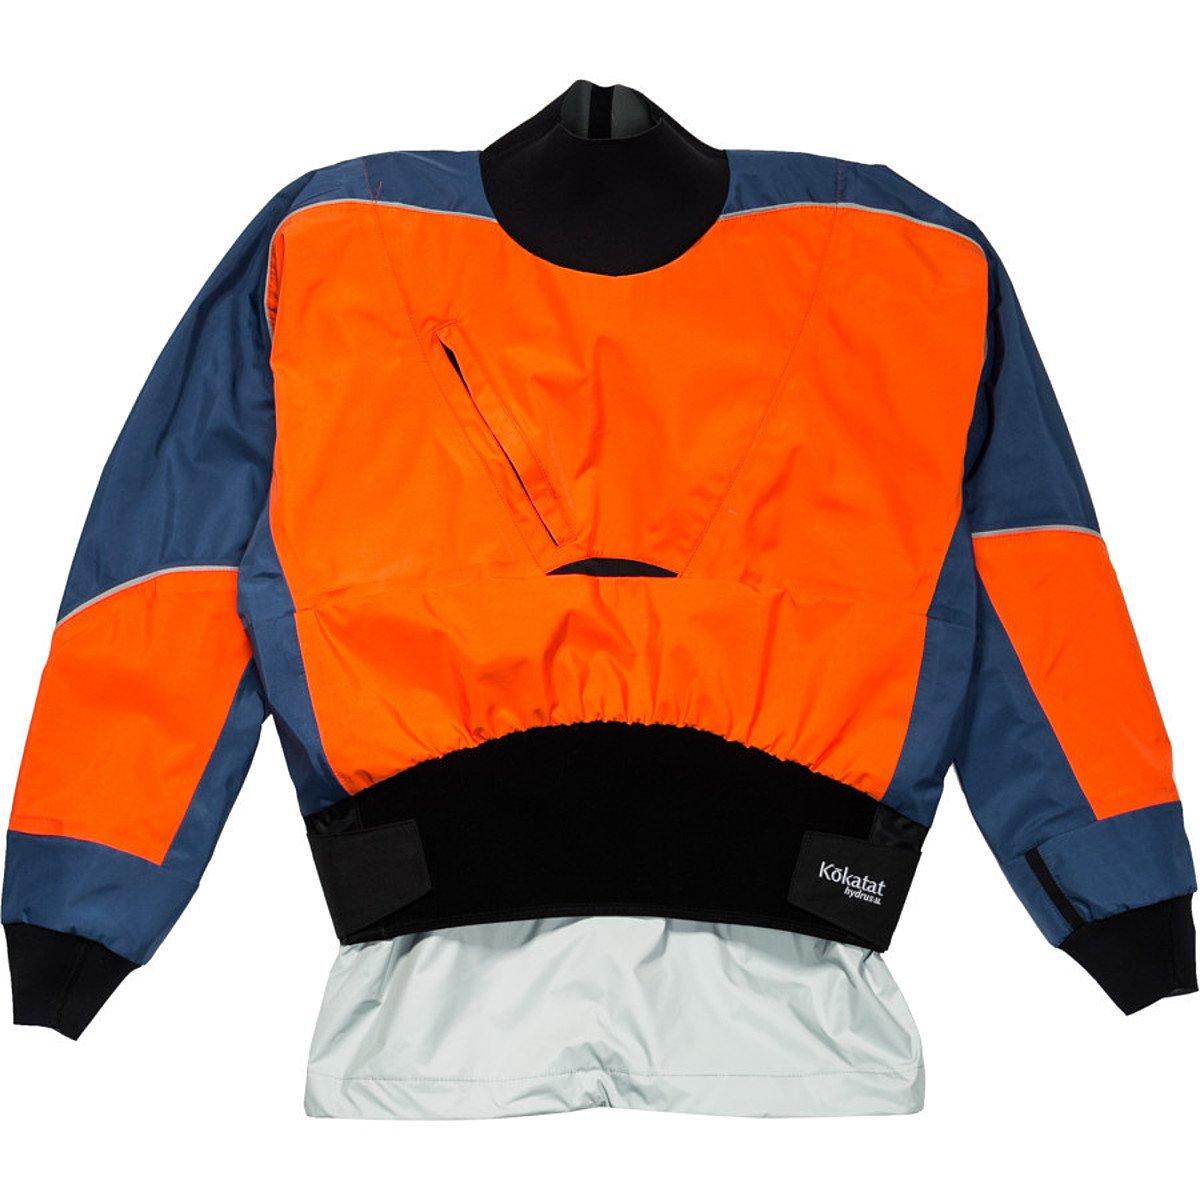 Kokatat Hydrus 3L Stoke Drytop - Men's Jackets SM Tangerine/Denim by Kokatat